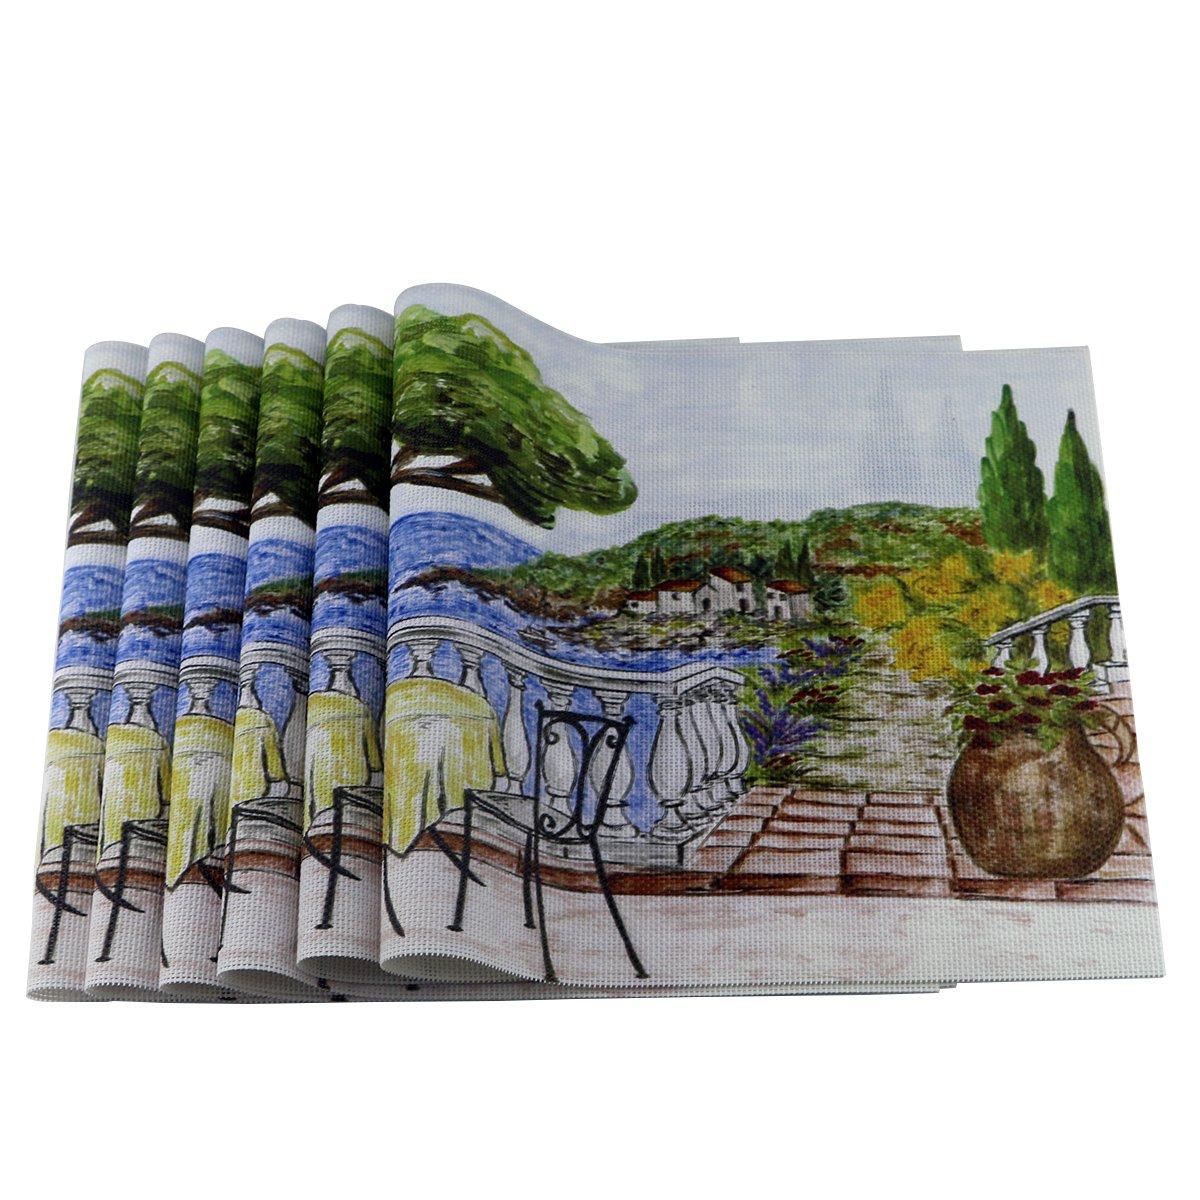 Uniturcky Placemat, PVC Jacquard Woven Vinyl Washable Dining Table Mats,Set of 6 - 30x45 cm